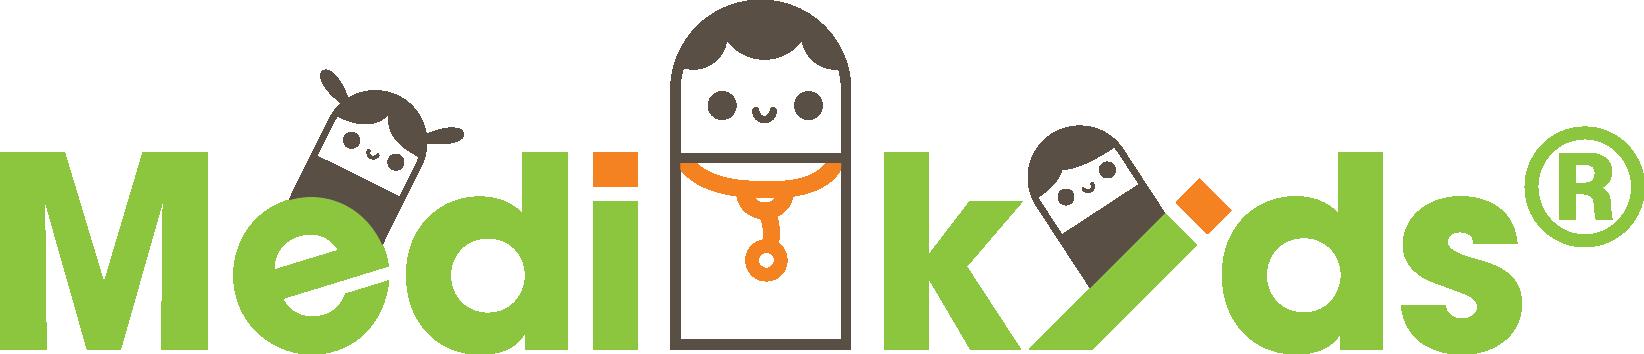 logo_medikids_vegleges